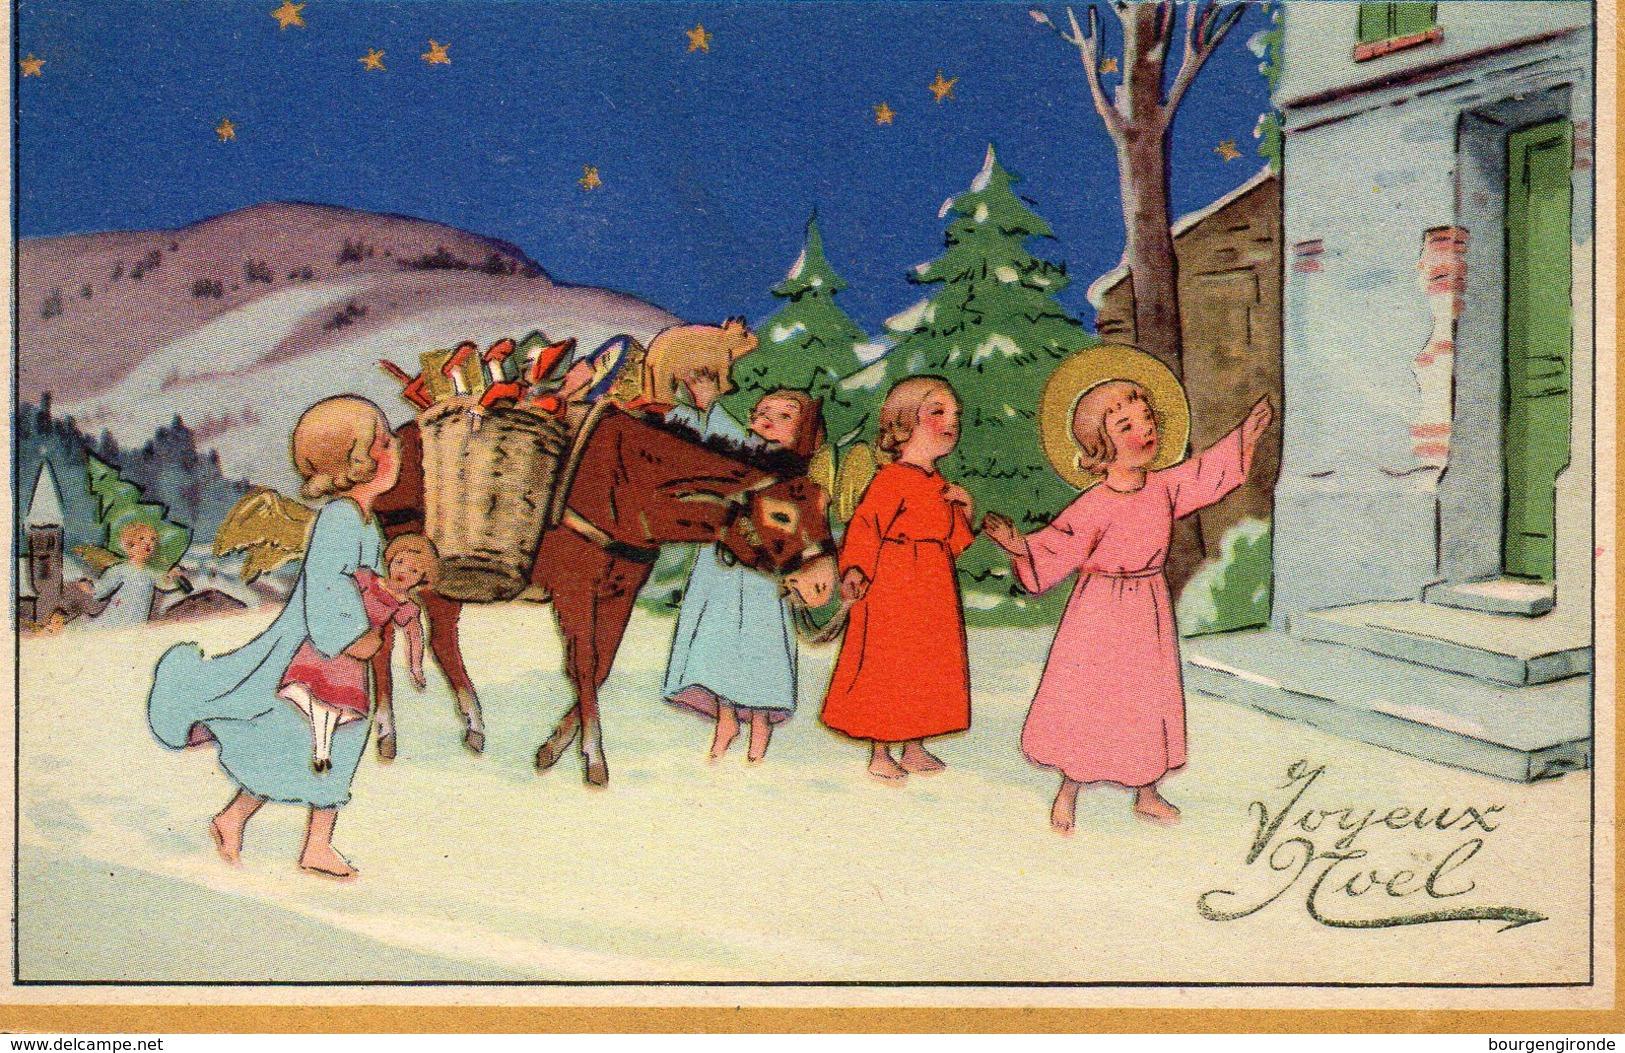 JOYEUX NOEL - Weihnachten